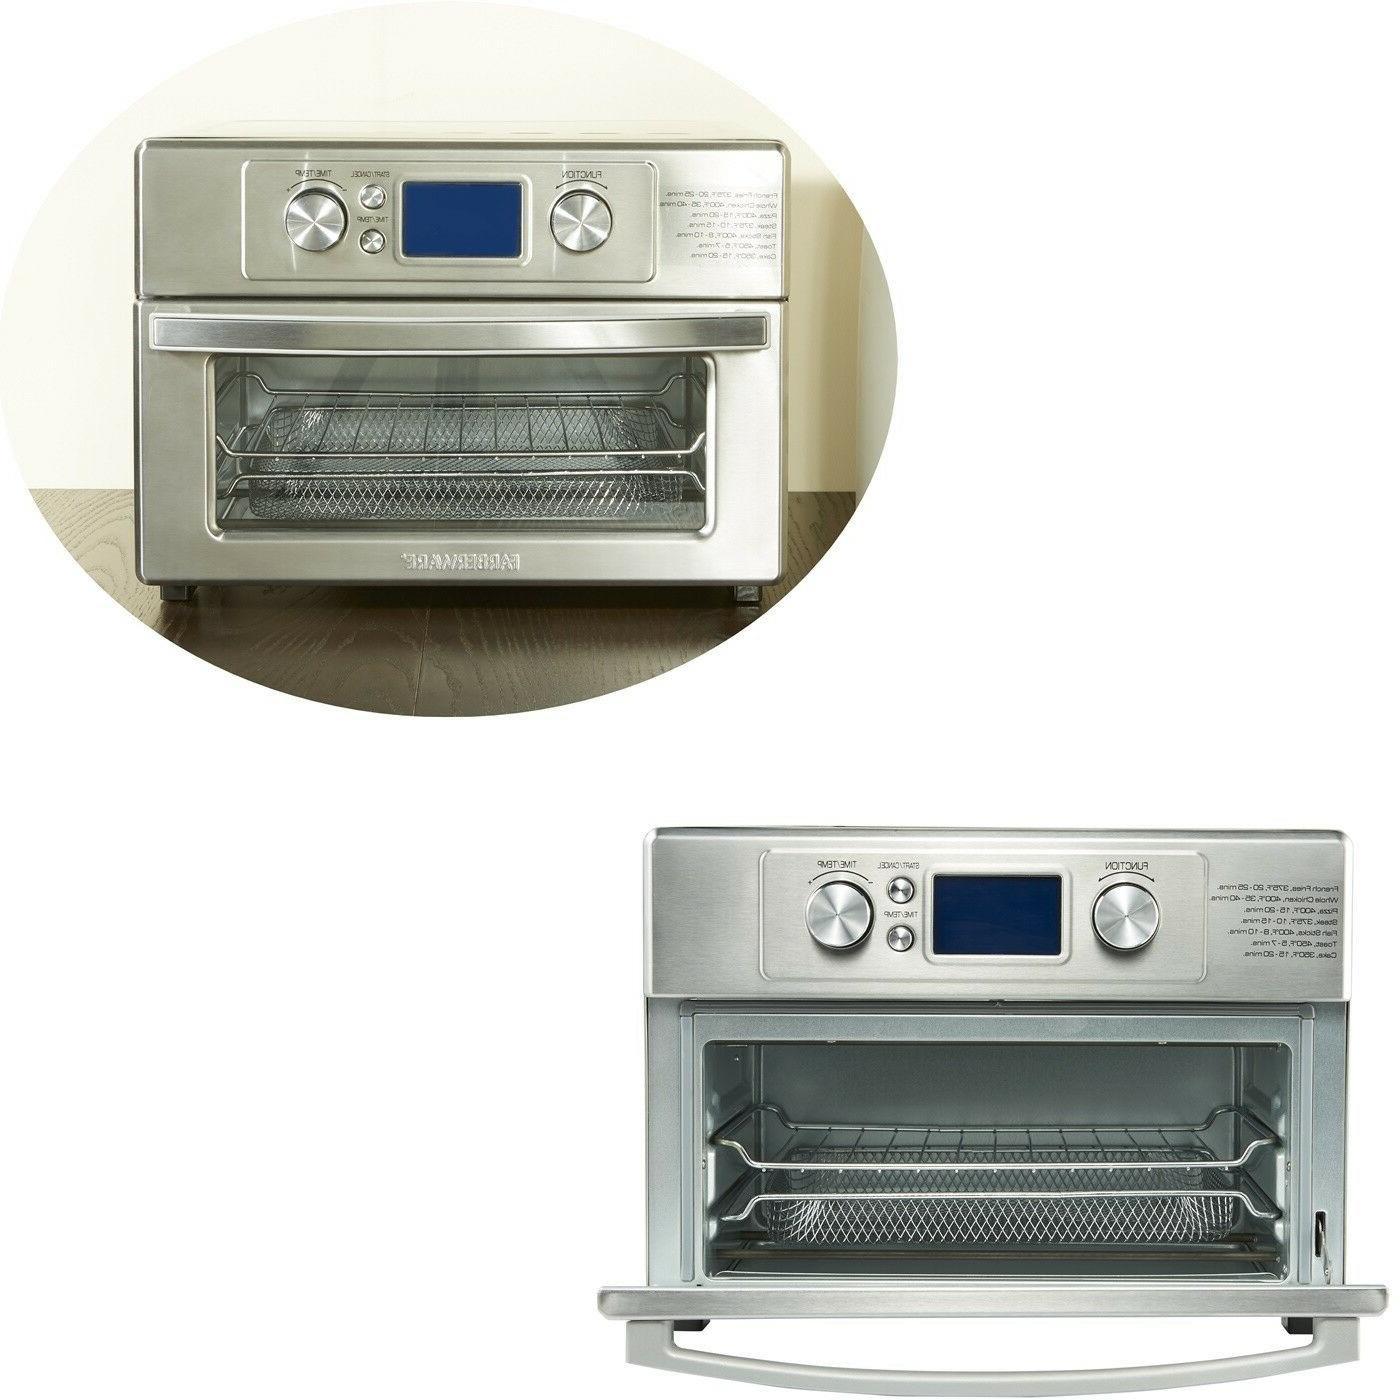 Farberware Air Fryer Toaster Oven Powerful Technology Preprogrammed